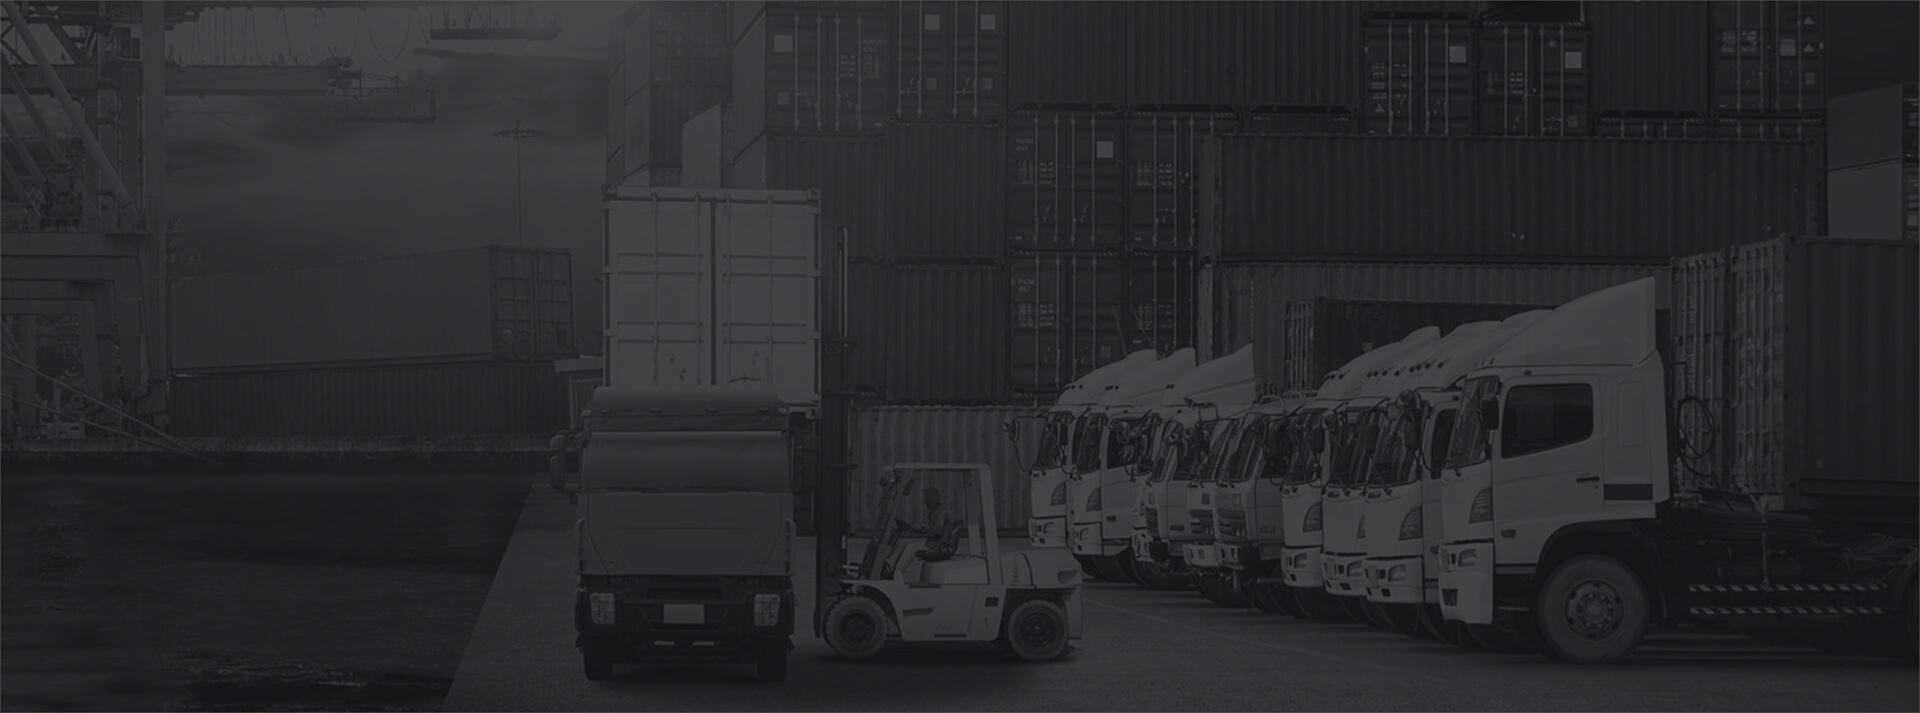 transport web design company